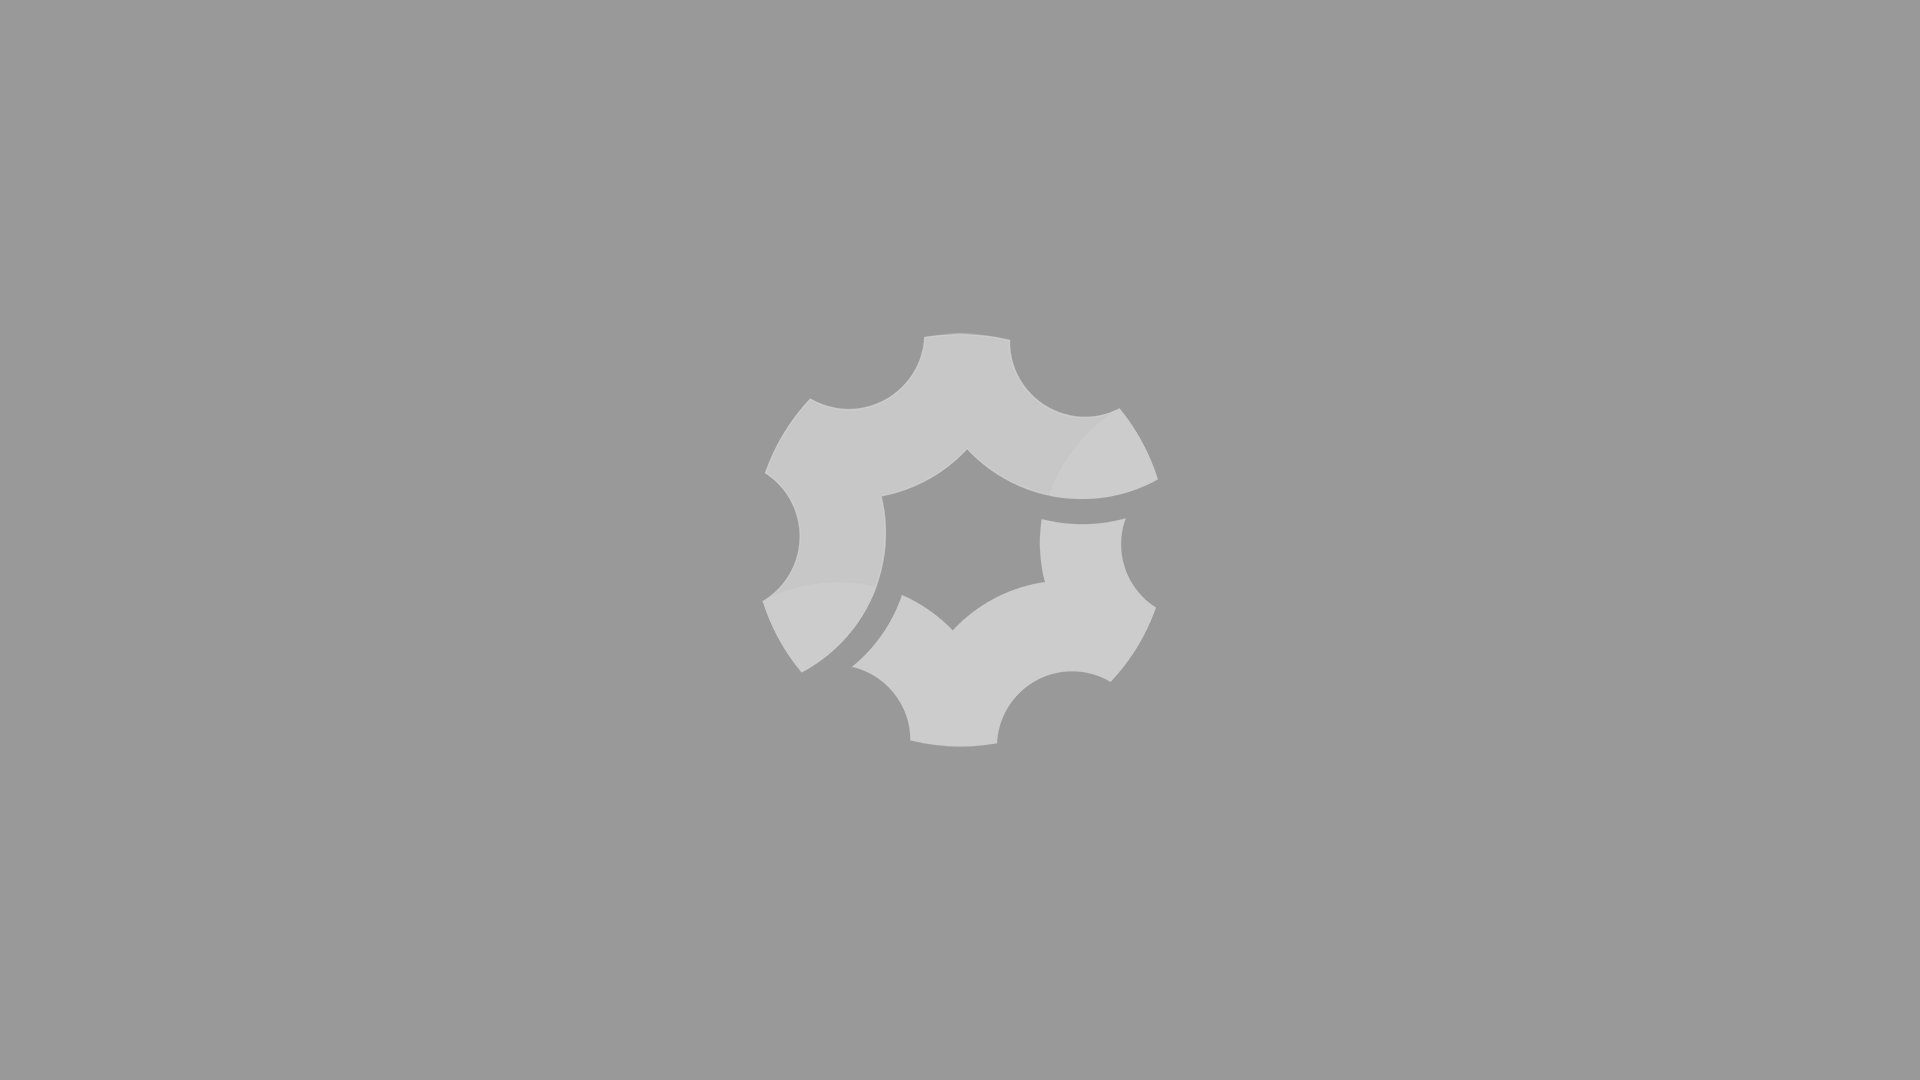 new_bitmap_image_2.bmp_thumb.png